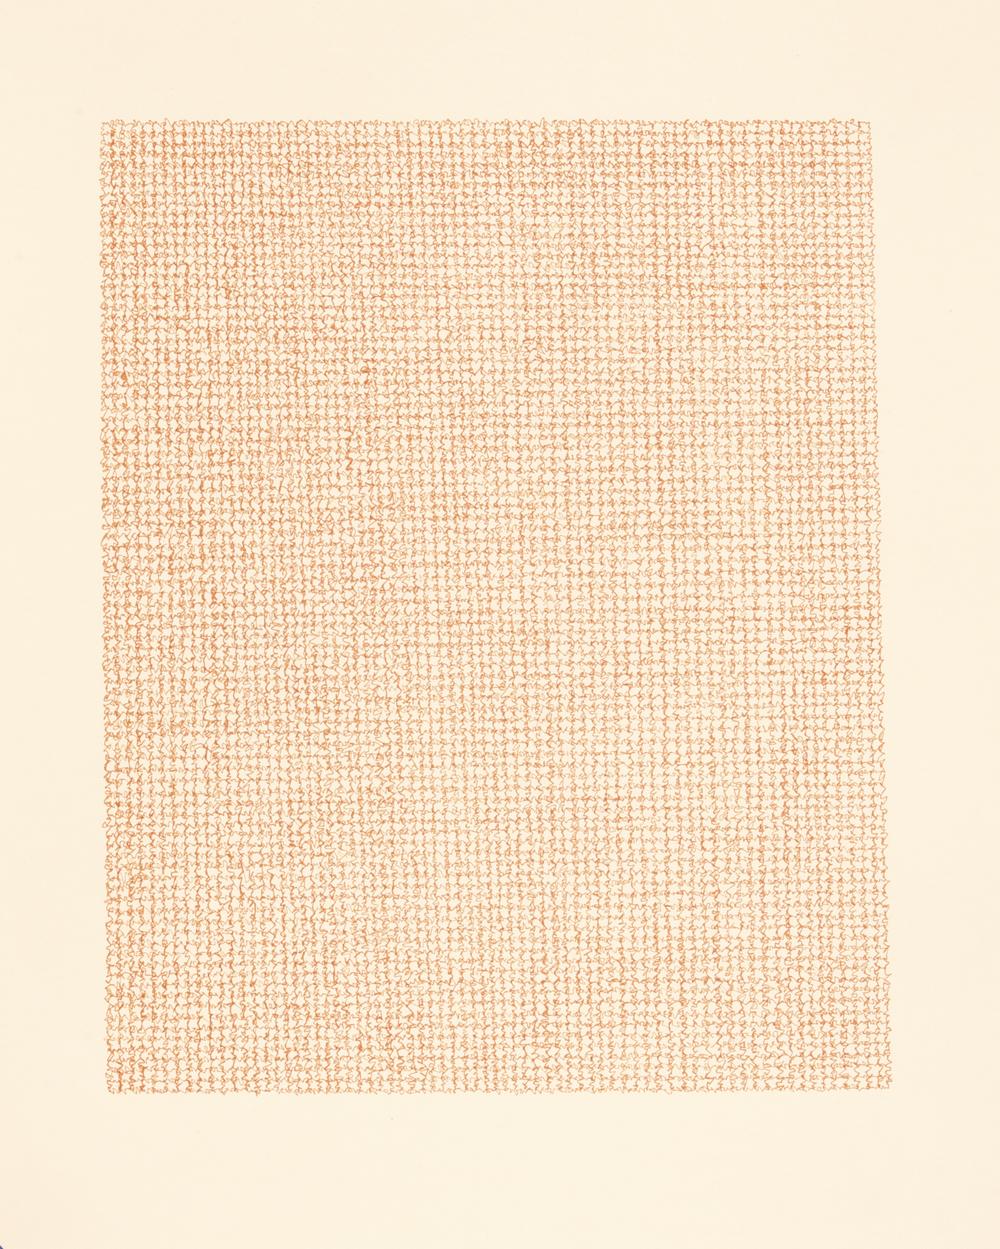 Untitled , 2013 / Ink on paper / 66cm 56cm